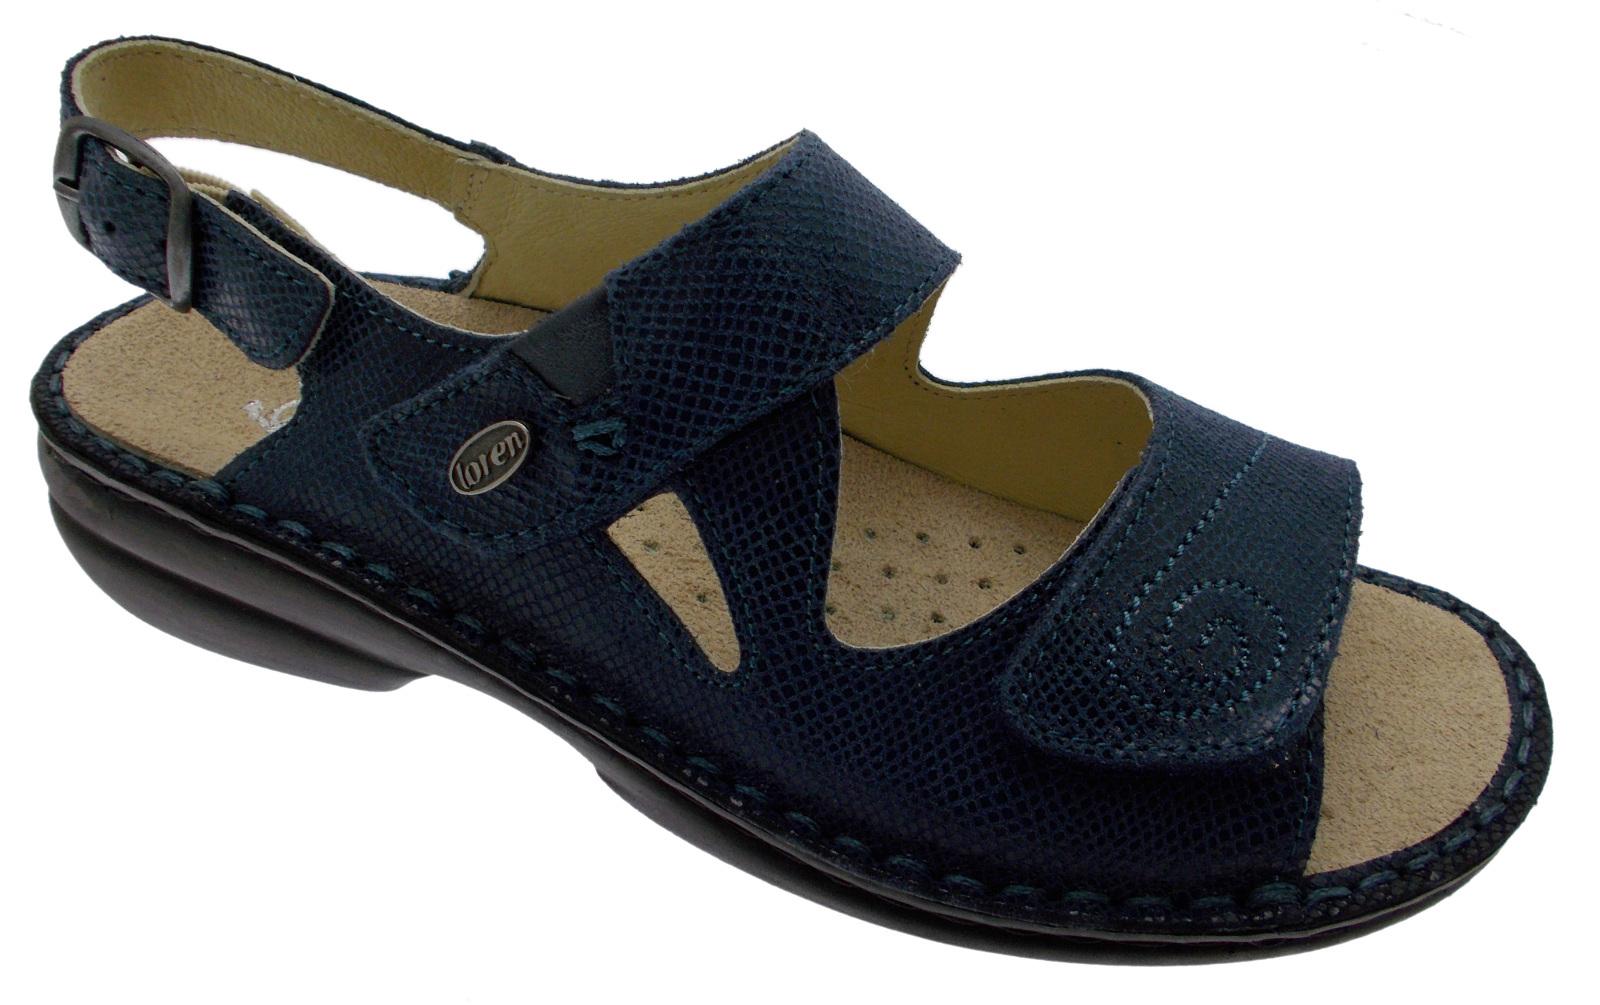 Orthop Sandale Orthop Orthop Sandale Sandale M2595 Sandale Sandale M2595 M2595 M2595 Sandale M2595 Orthop M2595 Orthop 7wAA5vRq